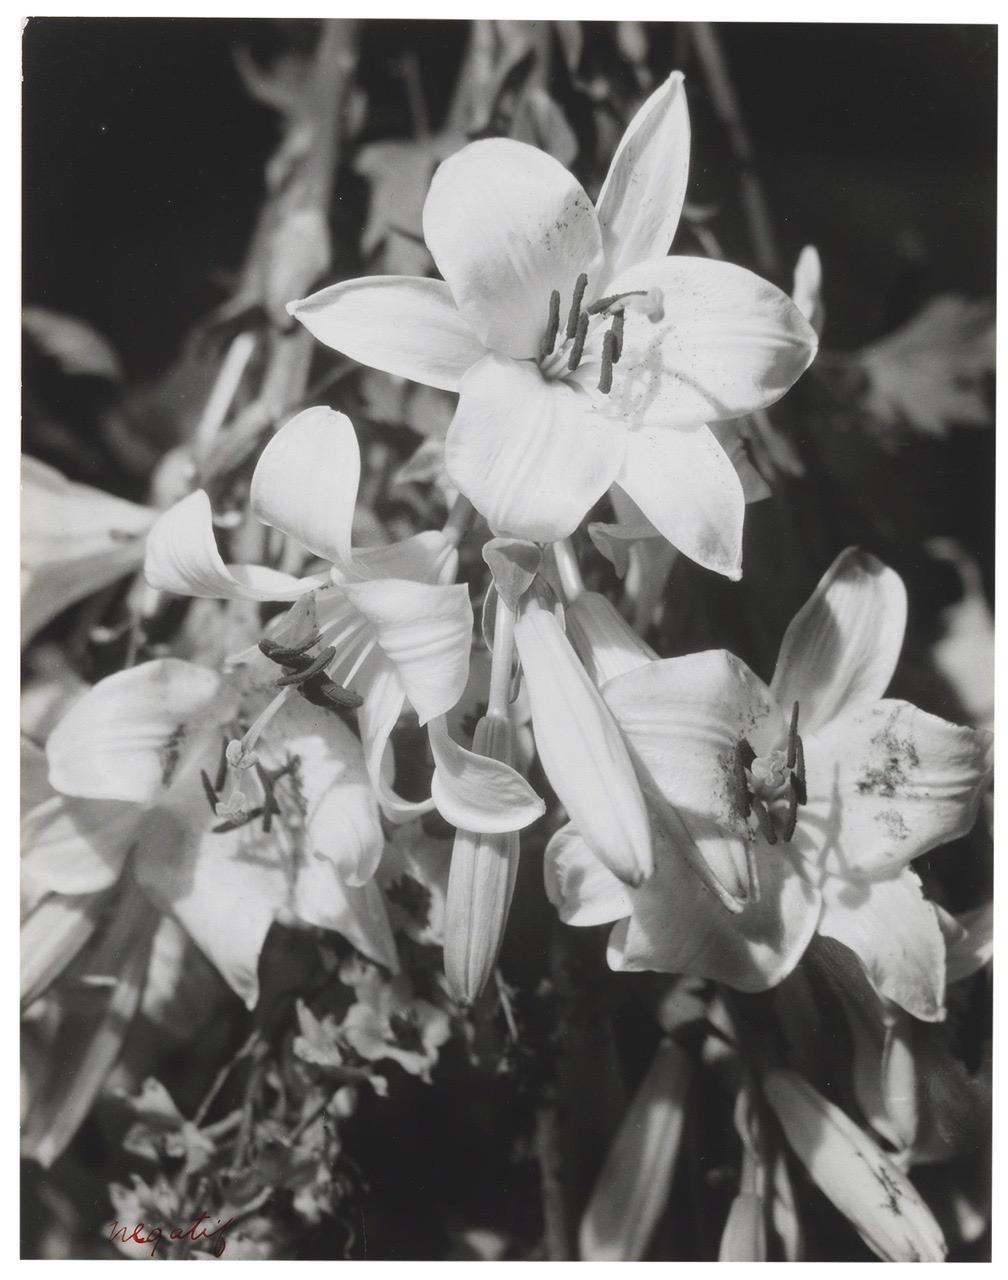 Man Ray, Lilies, 1925 , gelatin silver print